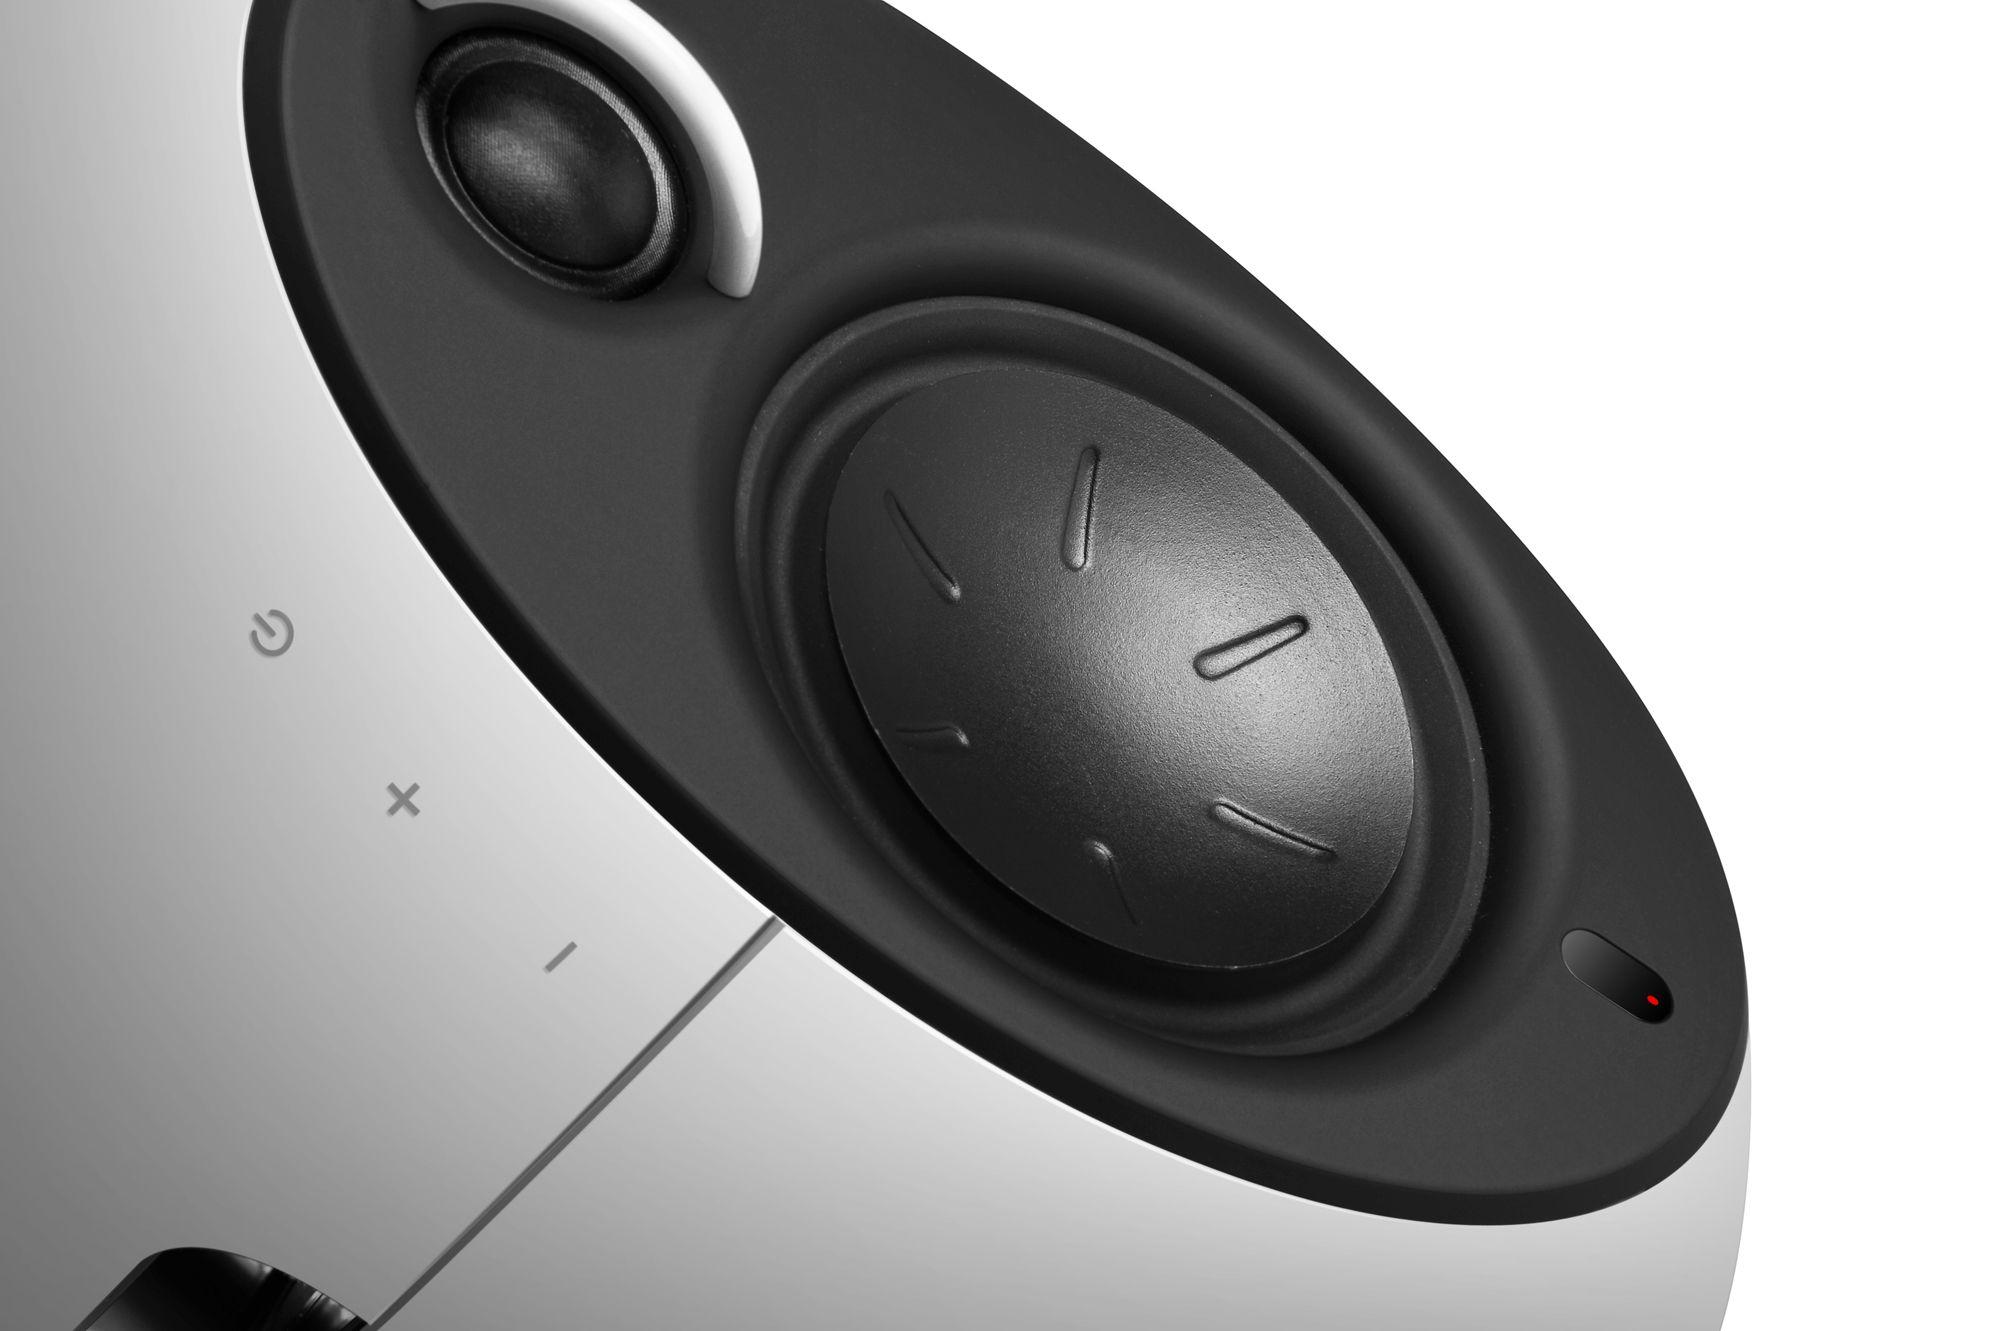 Edifier Luna Eclipse | Pc speakers, Home audio speakers, Edifier e25